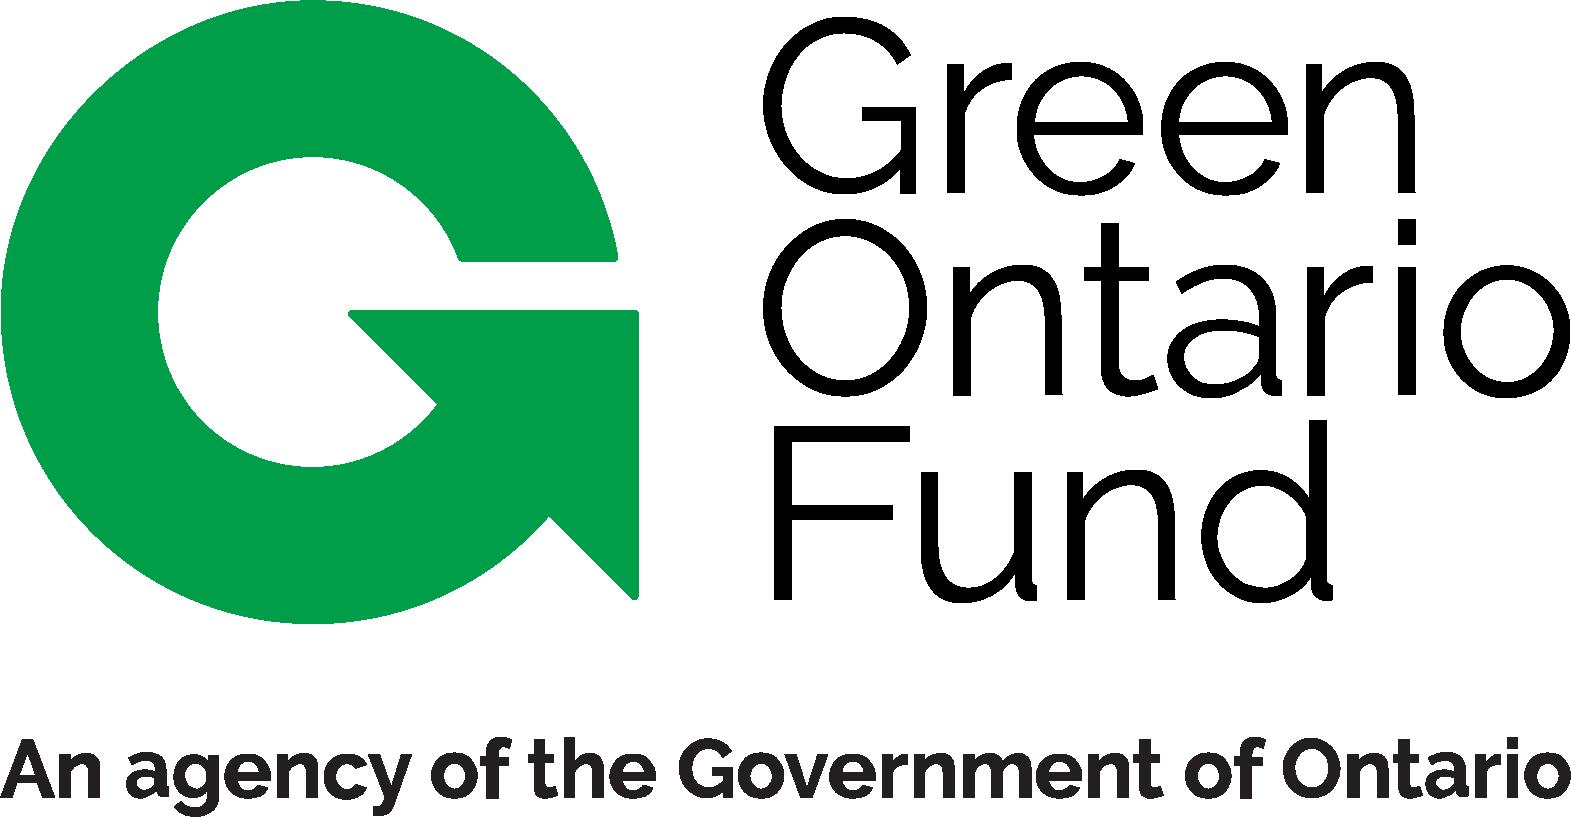 Green Ontario Fund Window Rebate Program